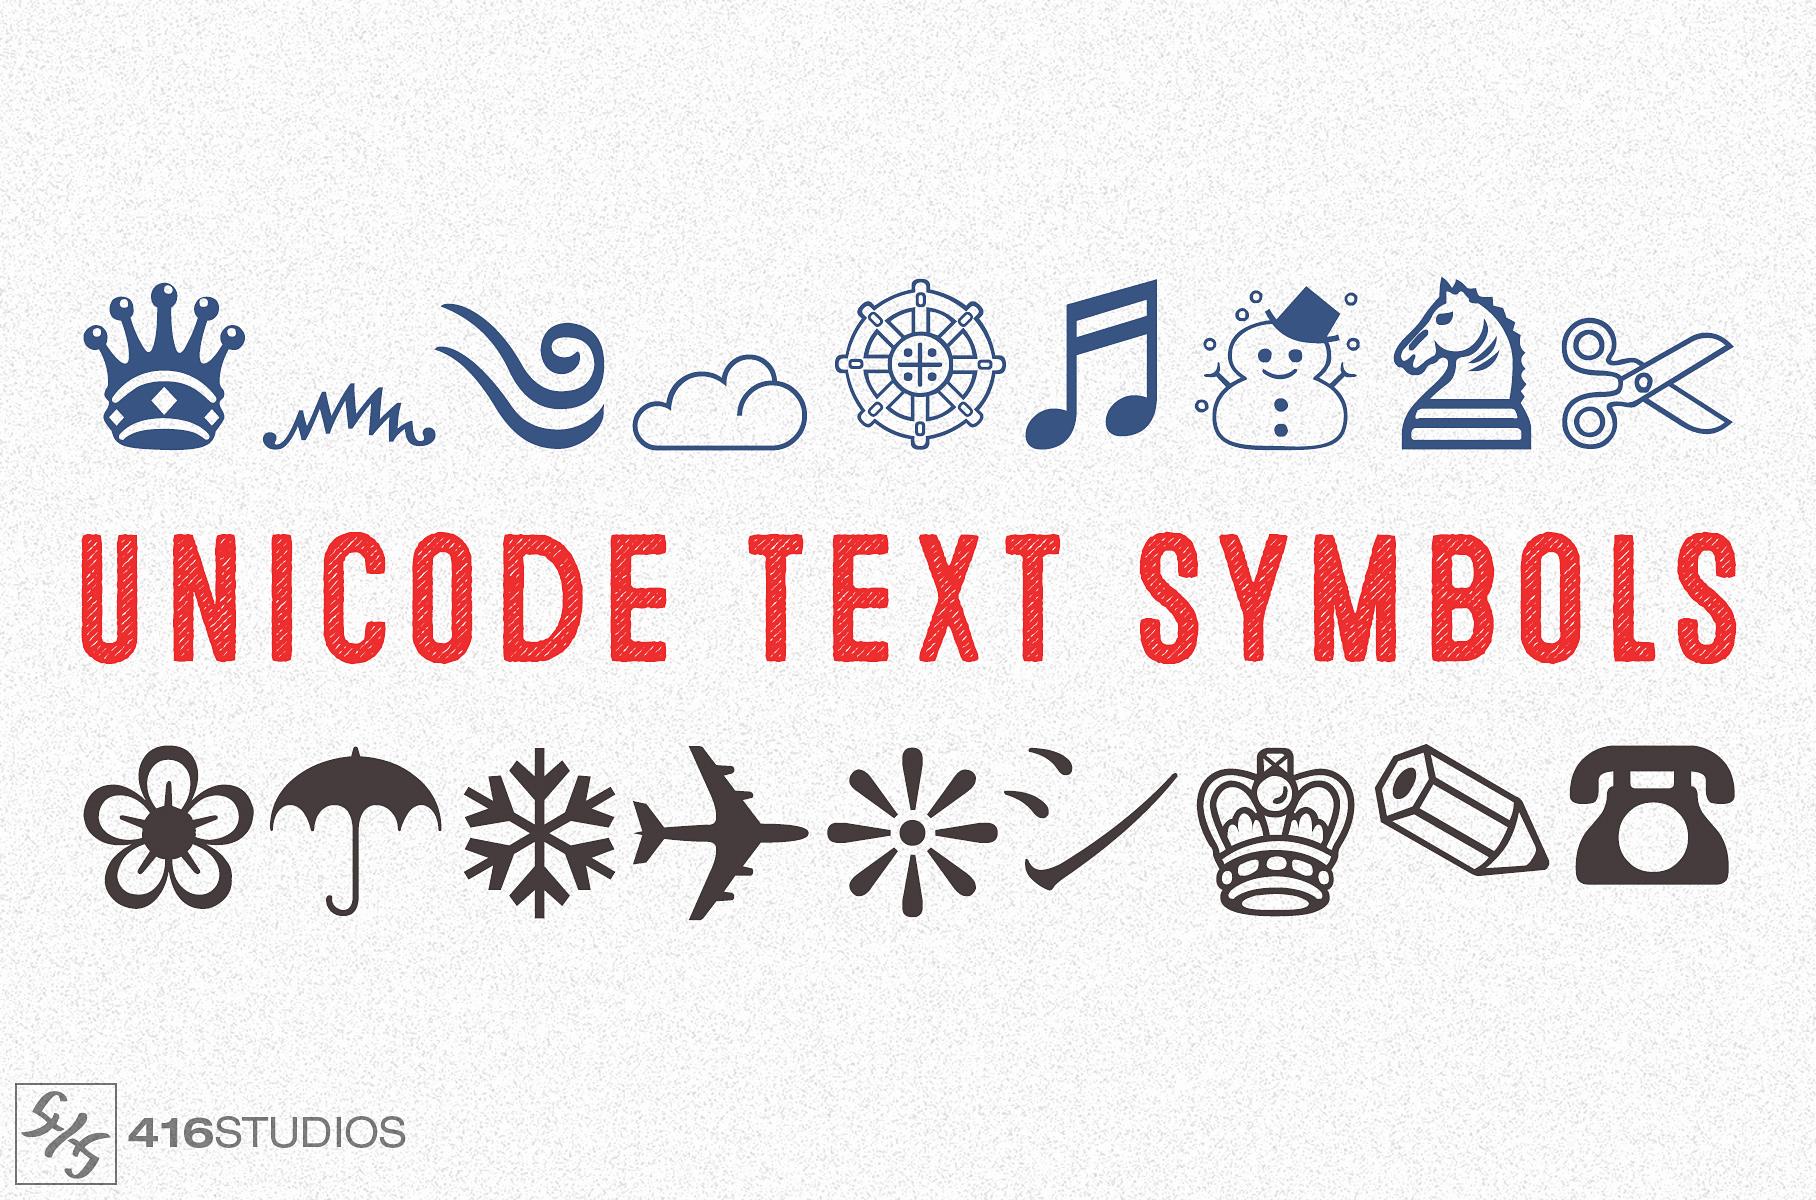 unicode text symbols emoji